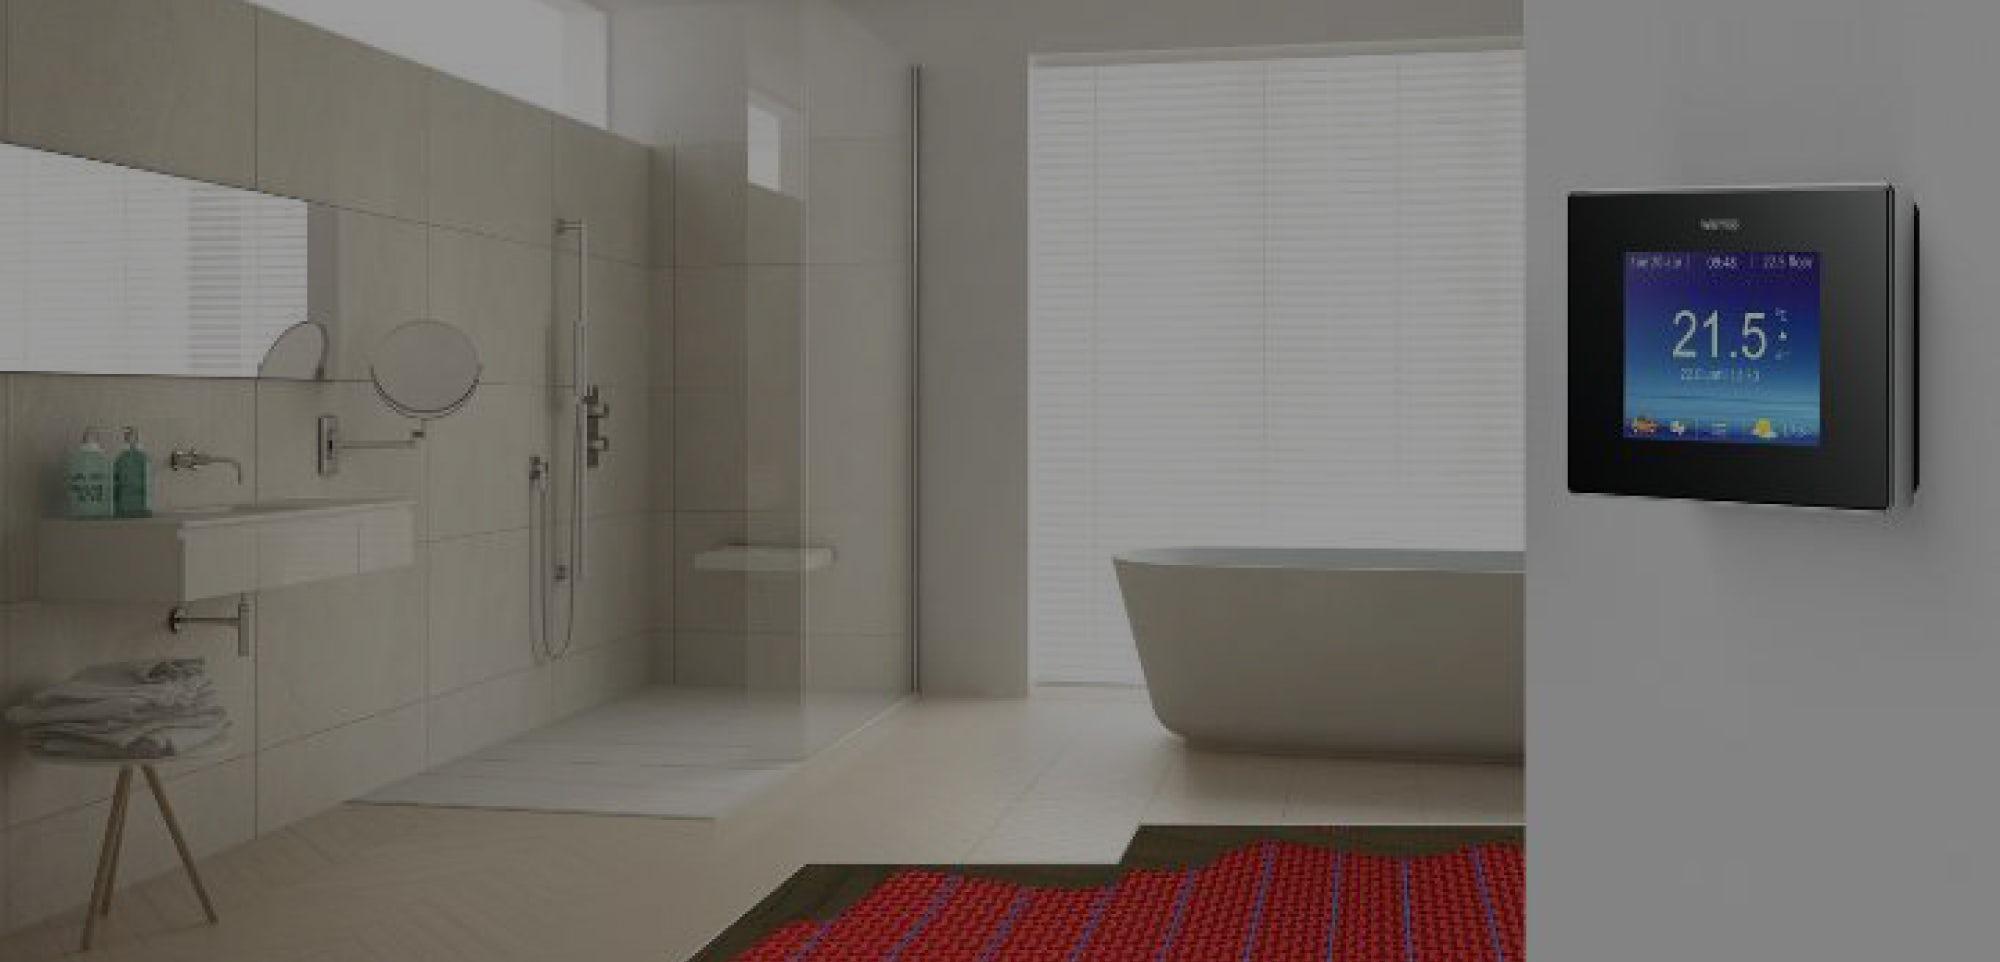 Remarkable Warmup Underfloor Heating Buying Guide Victoriaplum Com Download Free Architecture Designs Embacsunscenecom